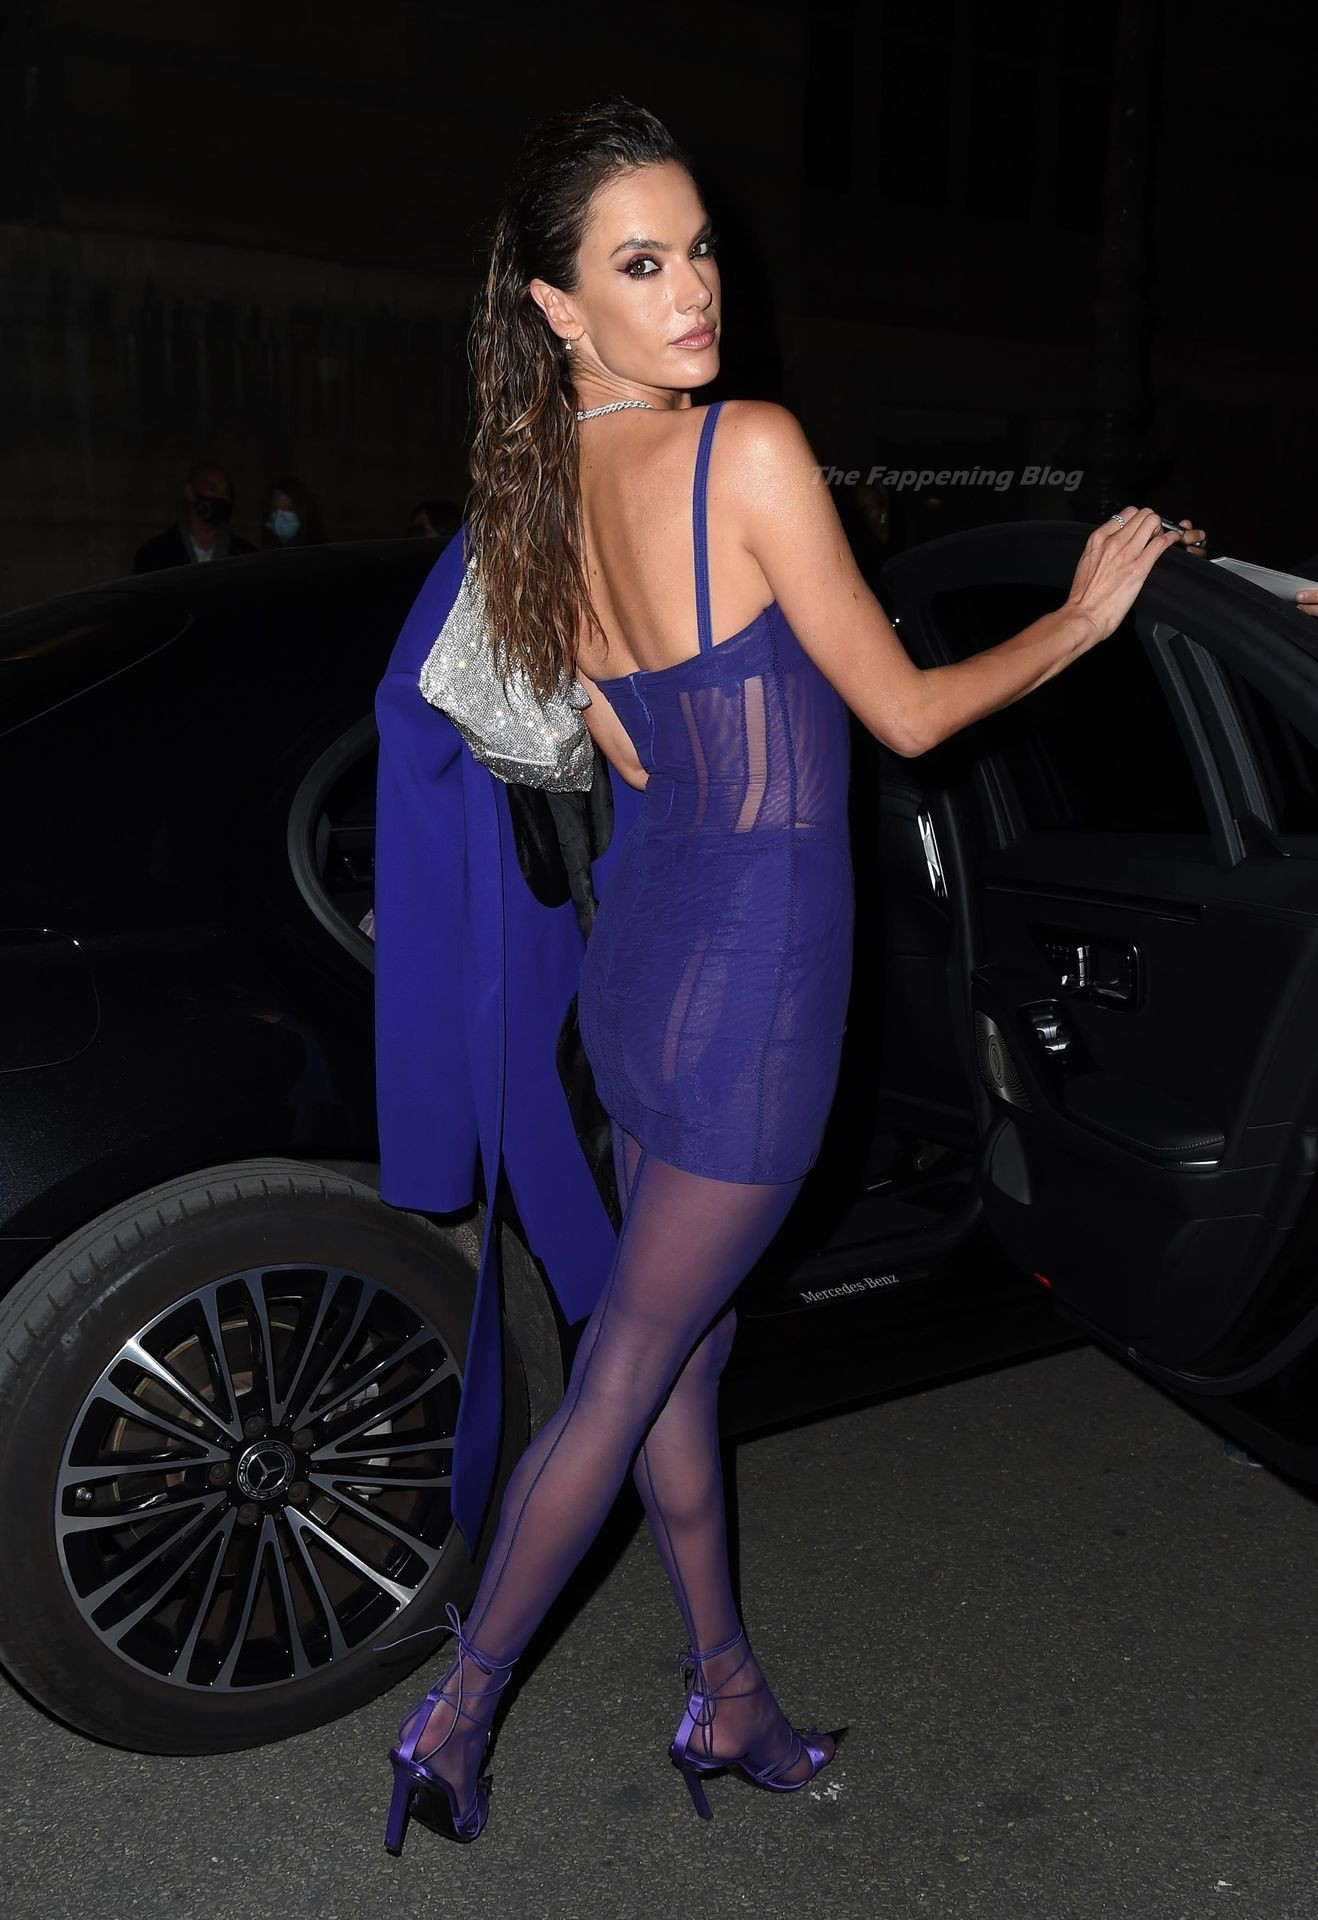 Alessandra-Ambrosio-Sexy-The-Fappening-Blog-25-2.jpg